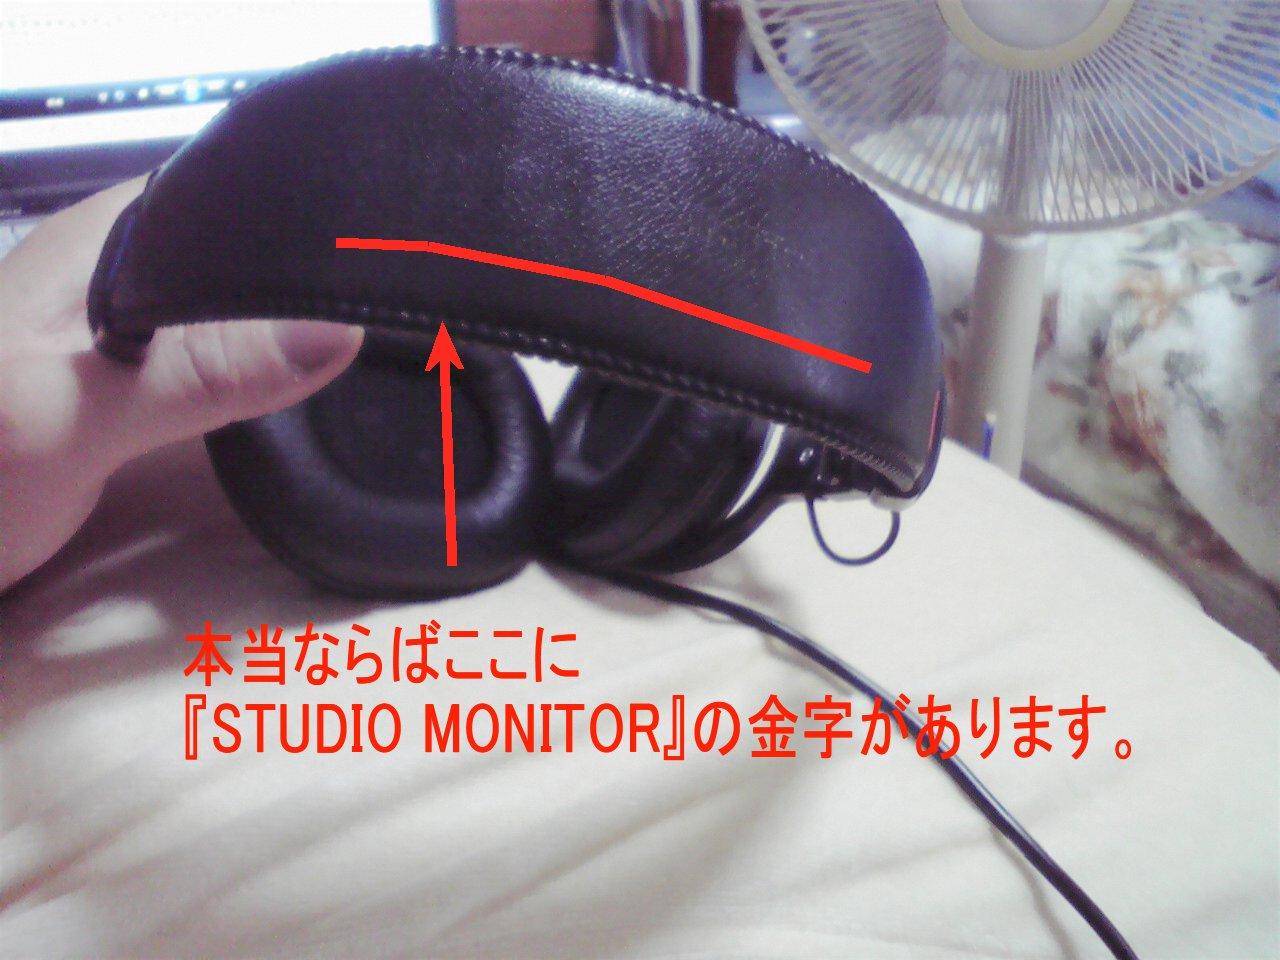 Mdr-cd900st 07